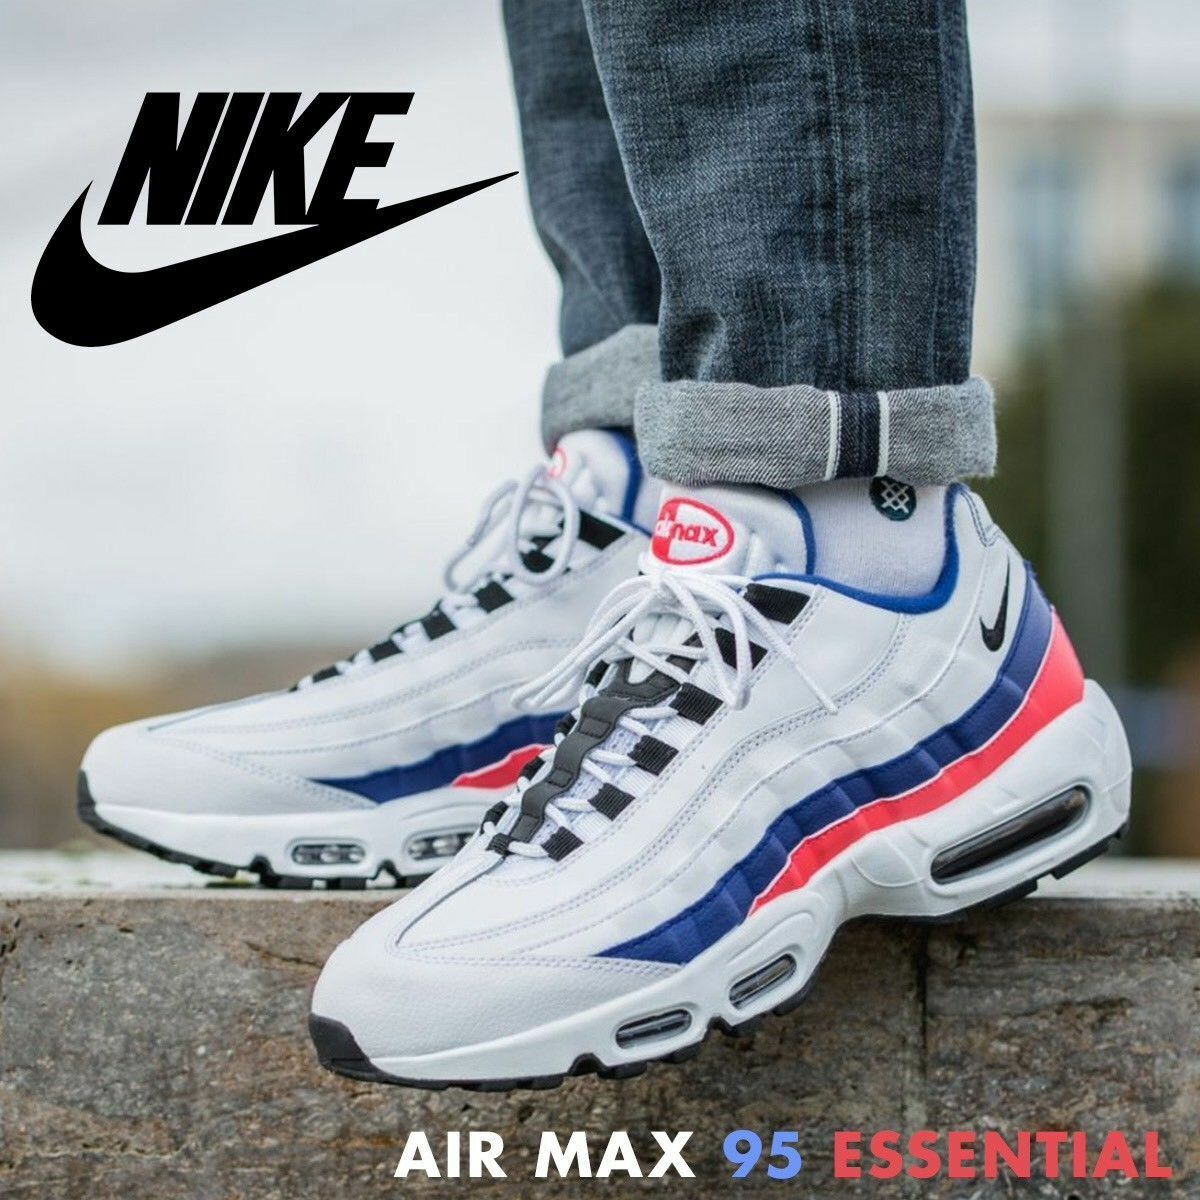 air max 95 essential casual shoes